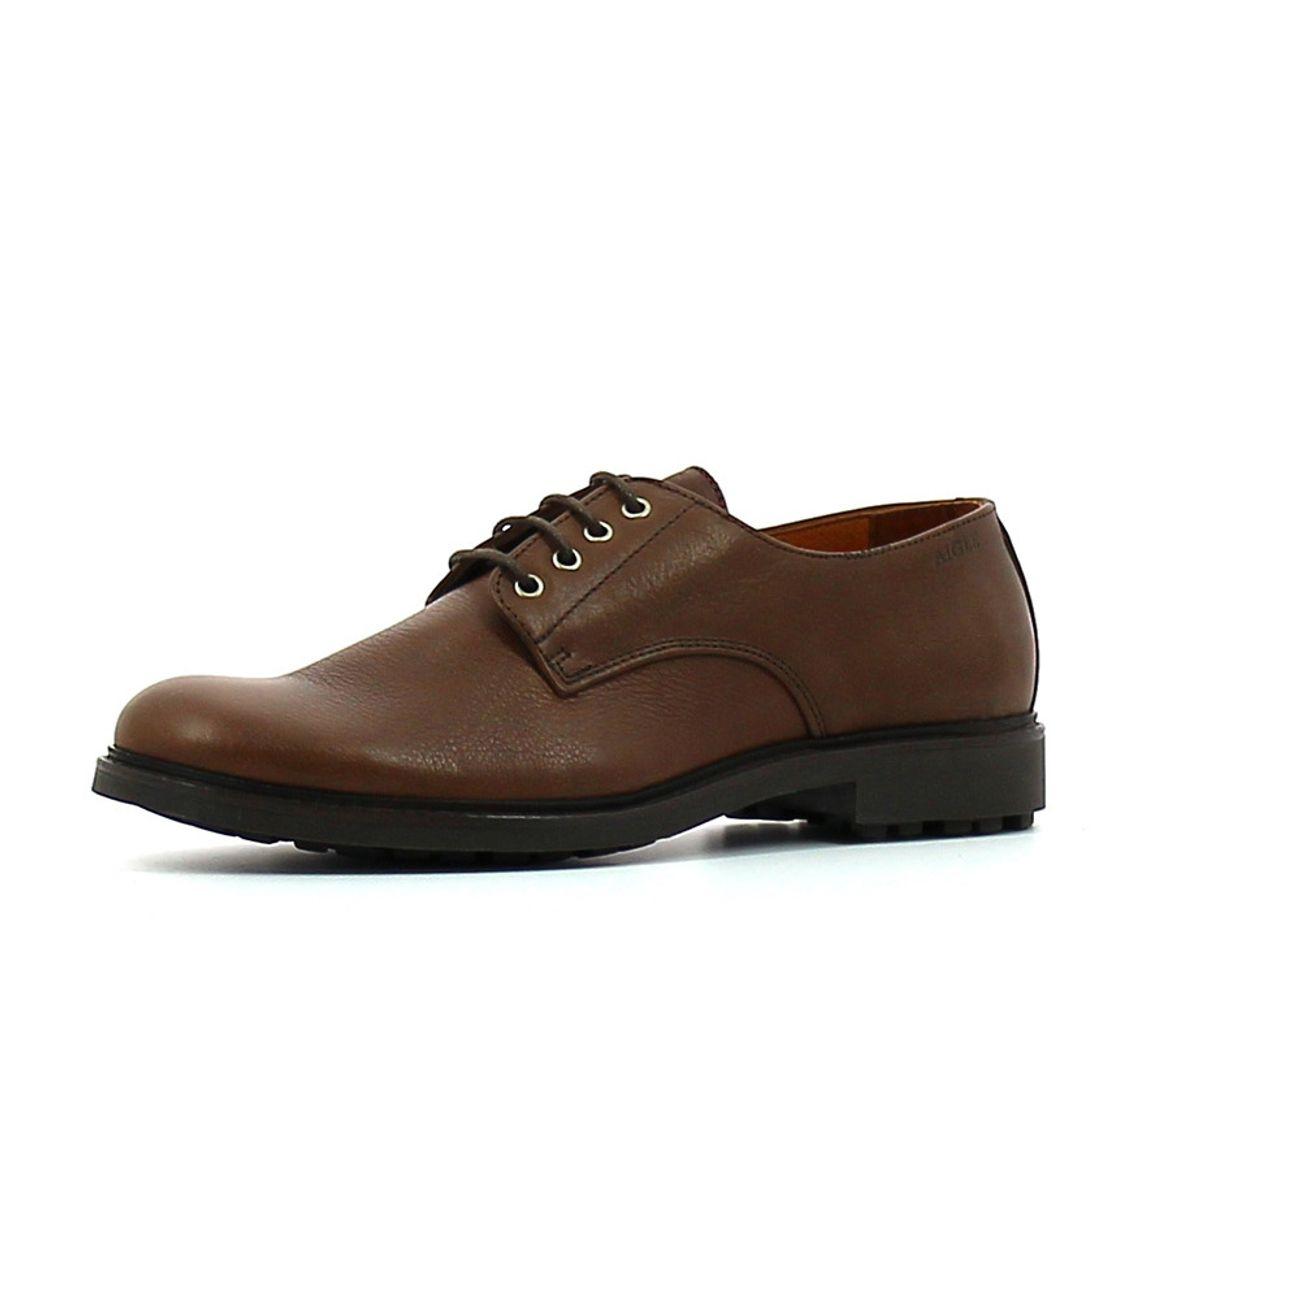 Aigle Ville Greton Chaussures Derby De Ybf7gvy6